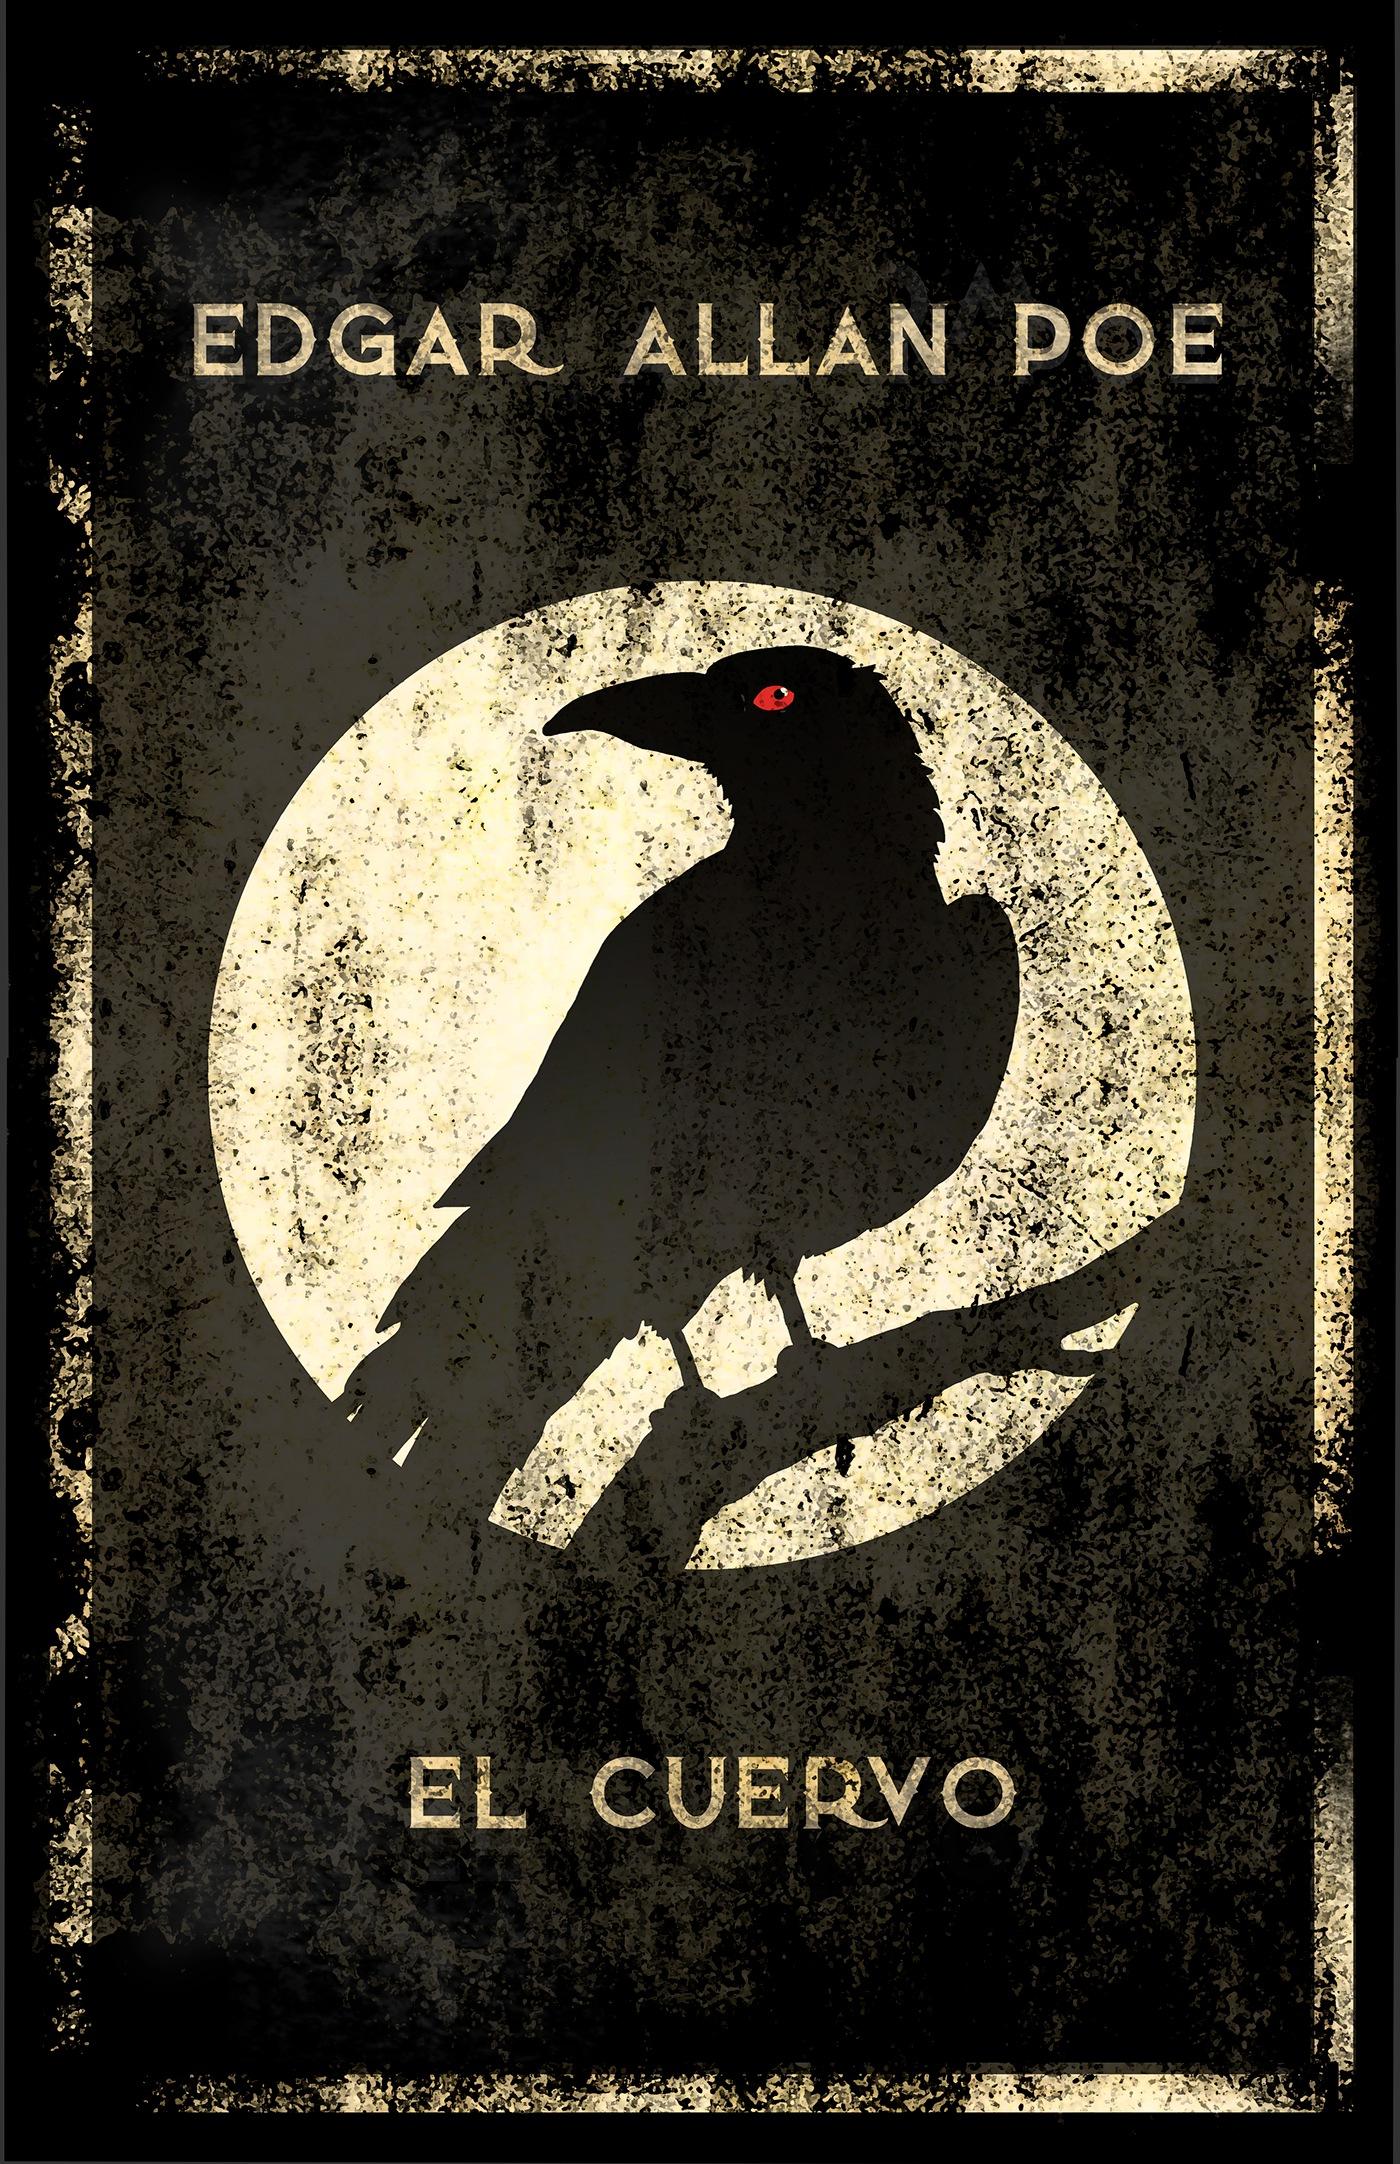 Edgar Allan Poe Afiches / Edgar Allan Poe's Posters on Behance